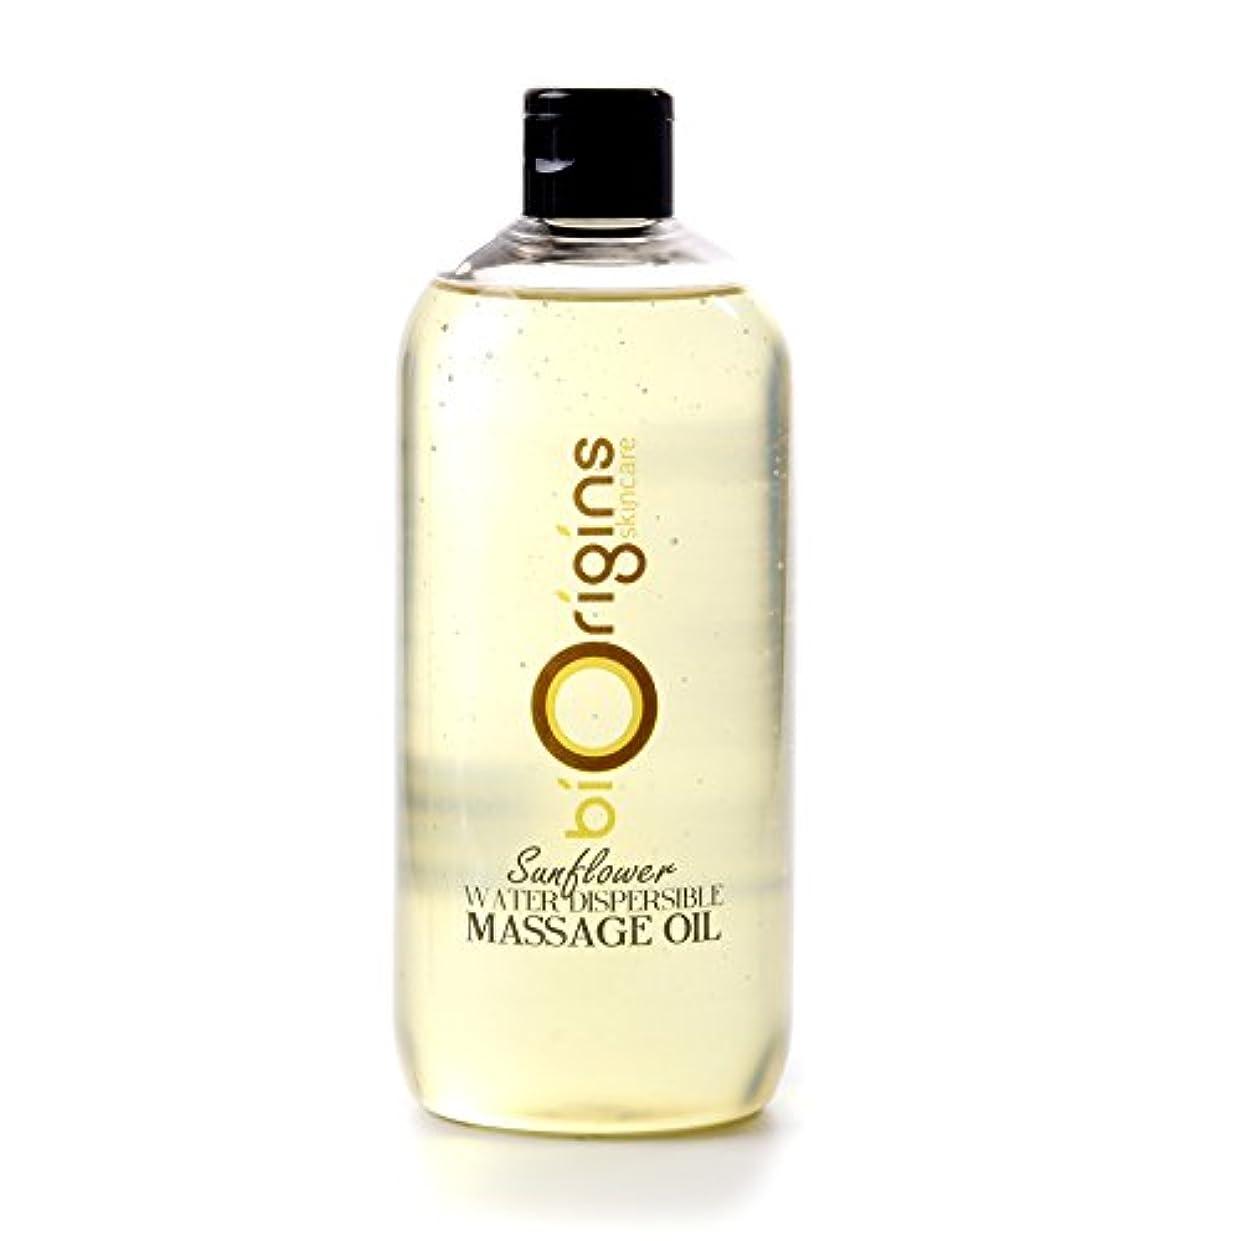 Sunflower Water Dispersible Massage Oil - 1 Litre - 100% Pure